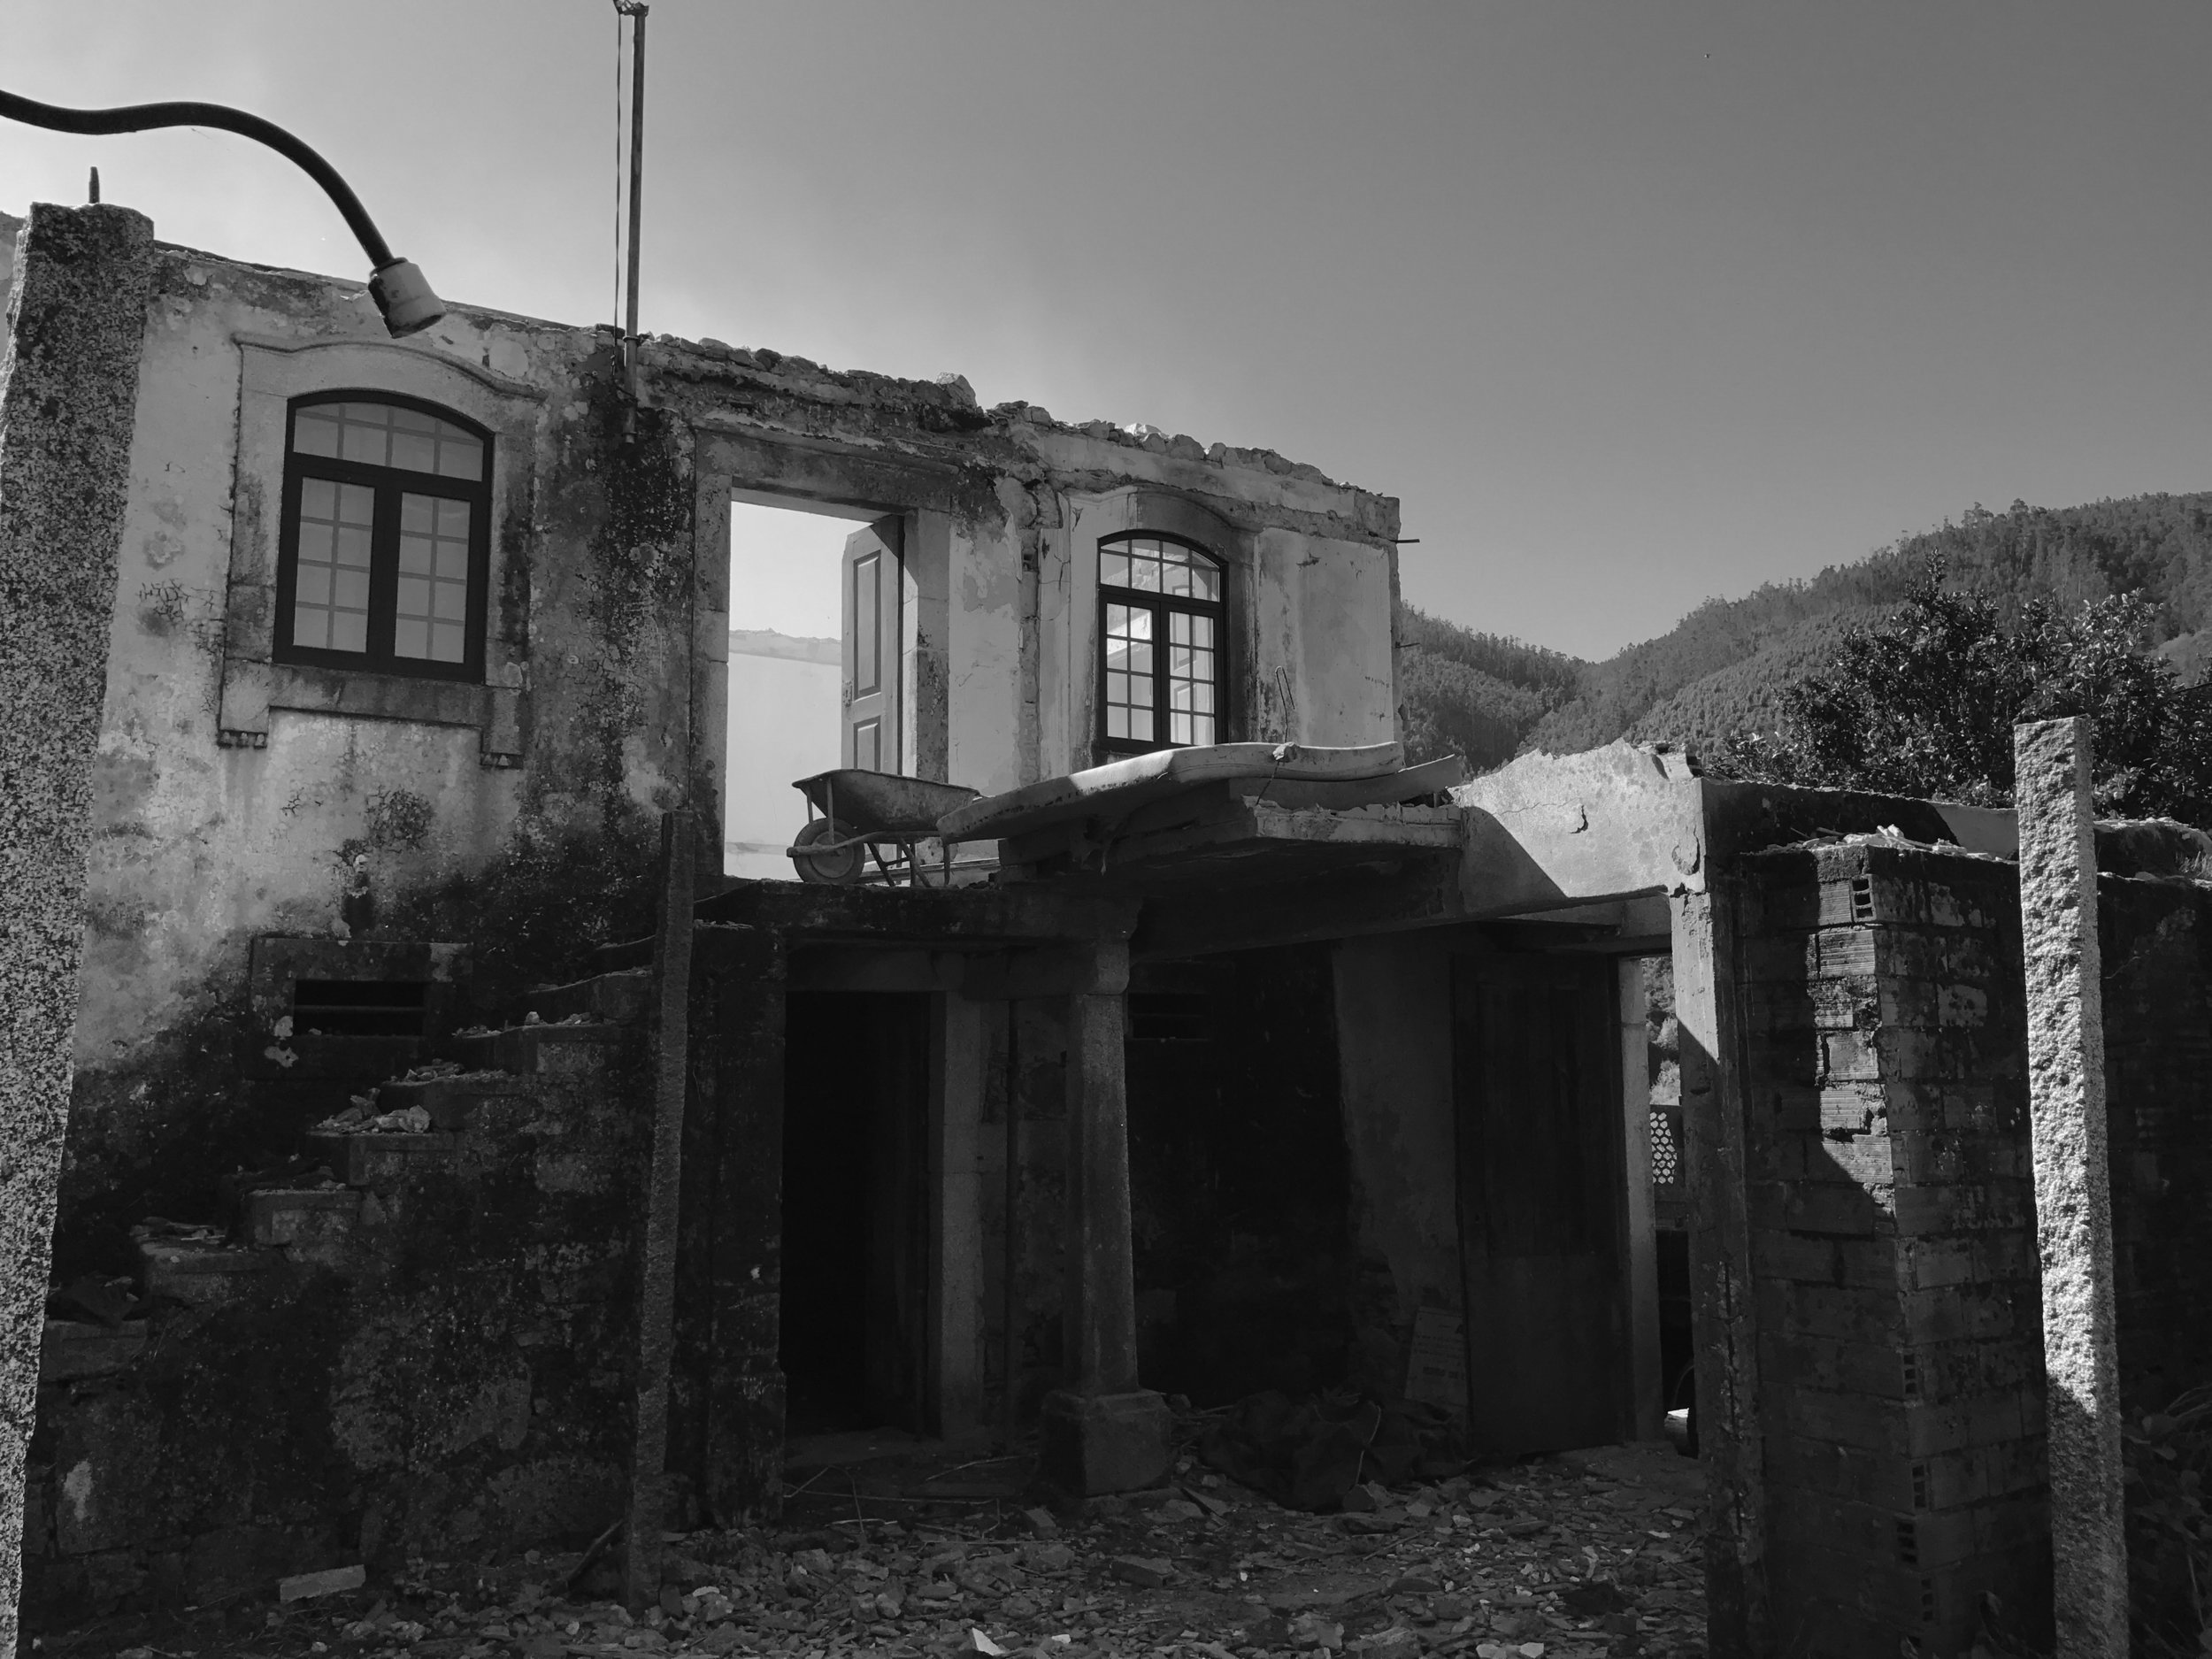 Moradia Folgorosa - Vale de Cambra - EVA atelier - Arquitectura - Obra (24).jpg